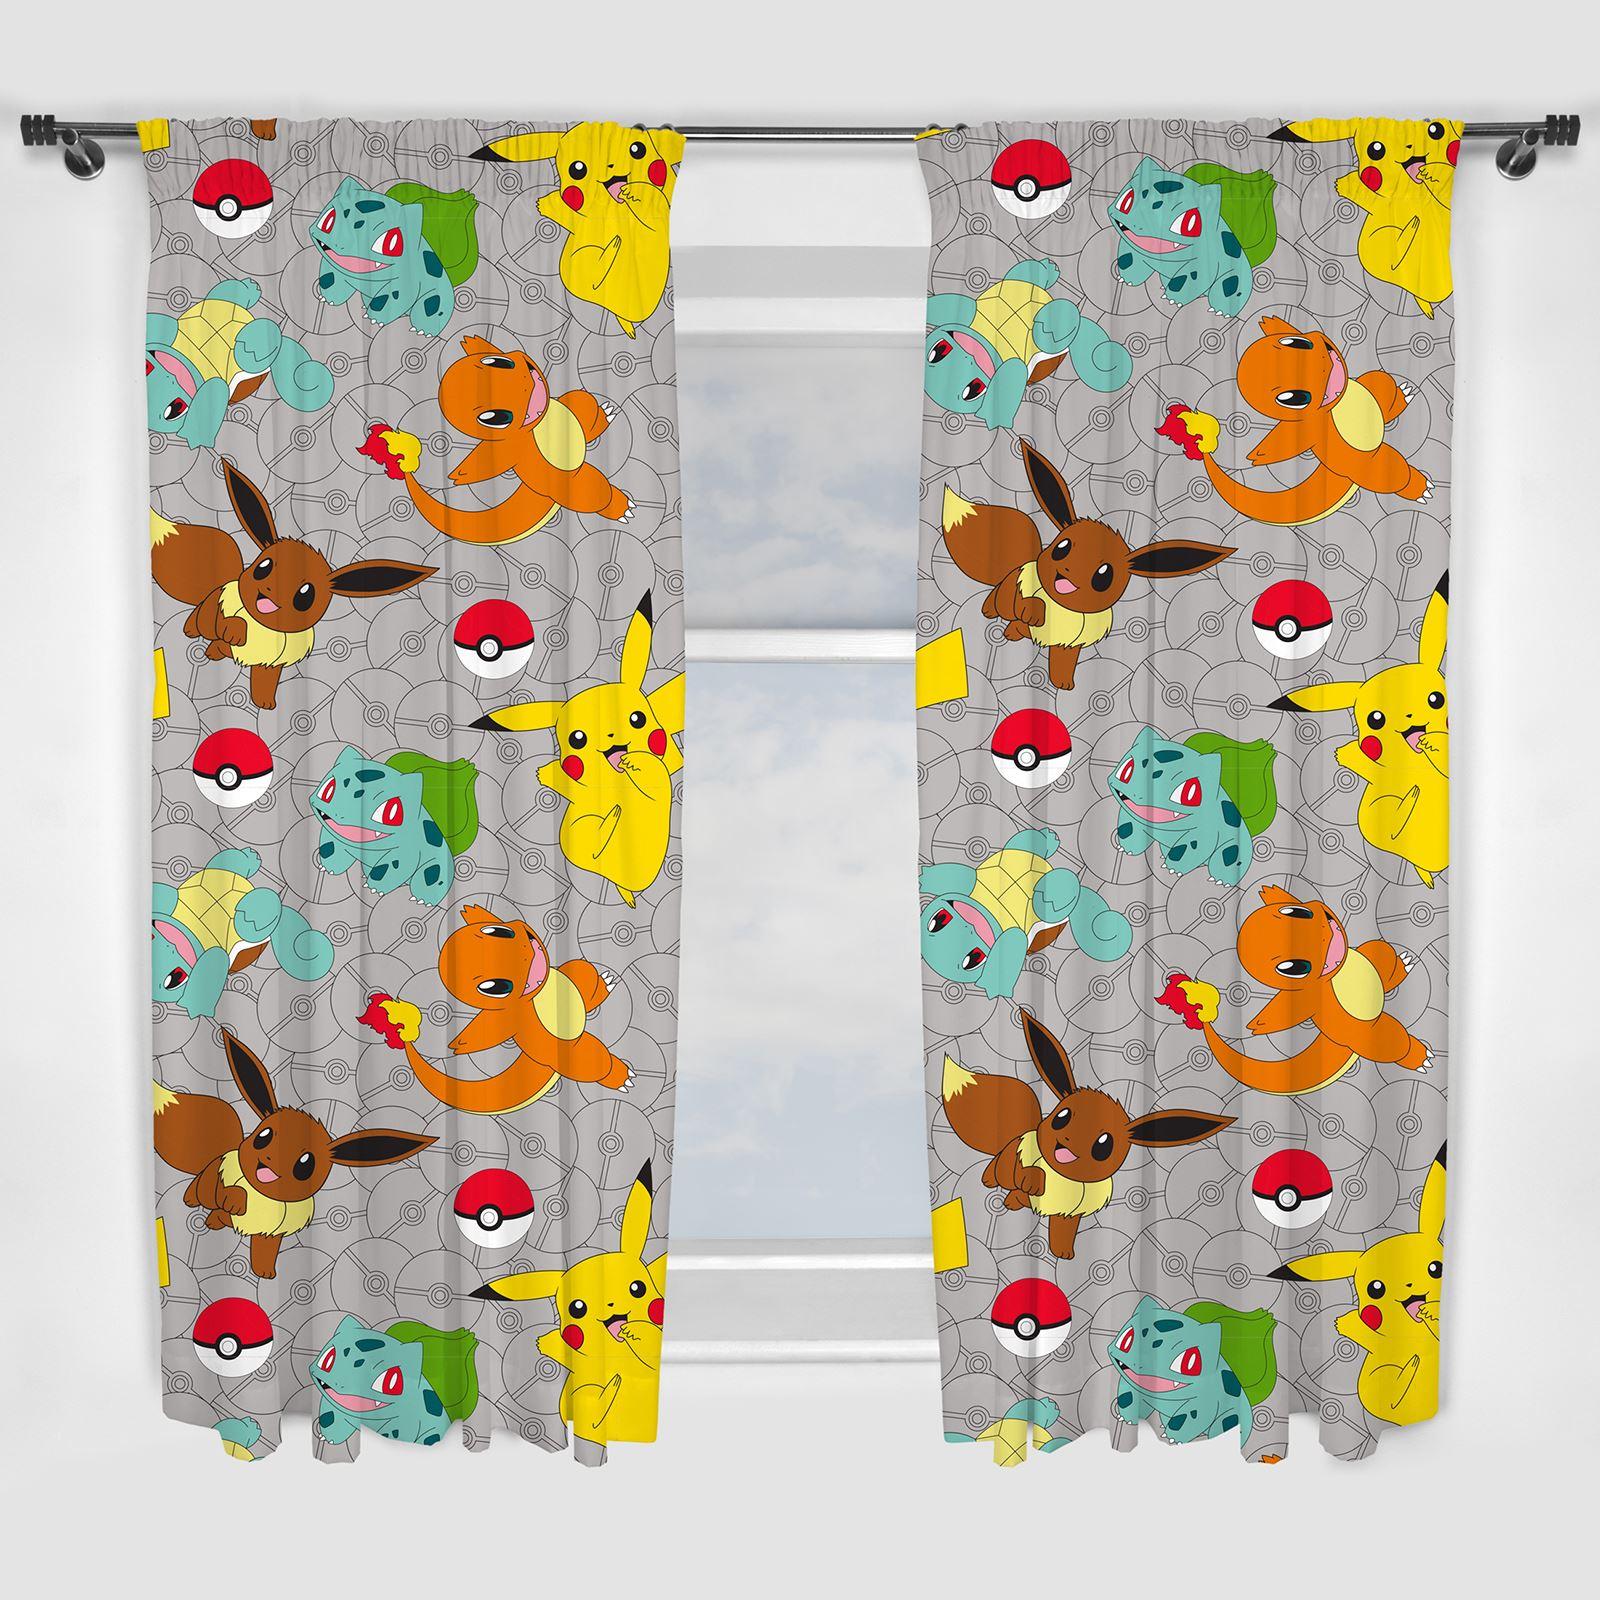 Disney & Character Jungen Vorhänge Schlafzimmer Marvel Paw Patrol Pokemon Thomas Pokemon Fang 183cm